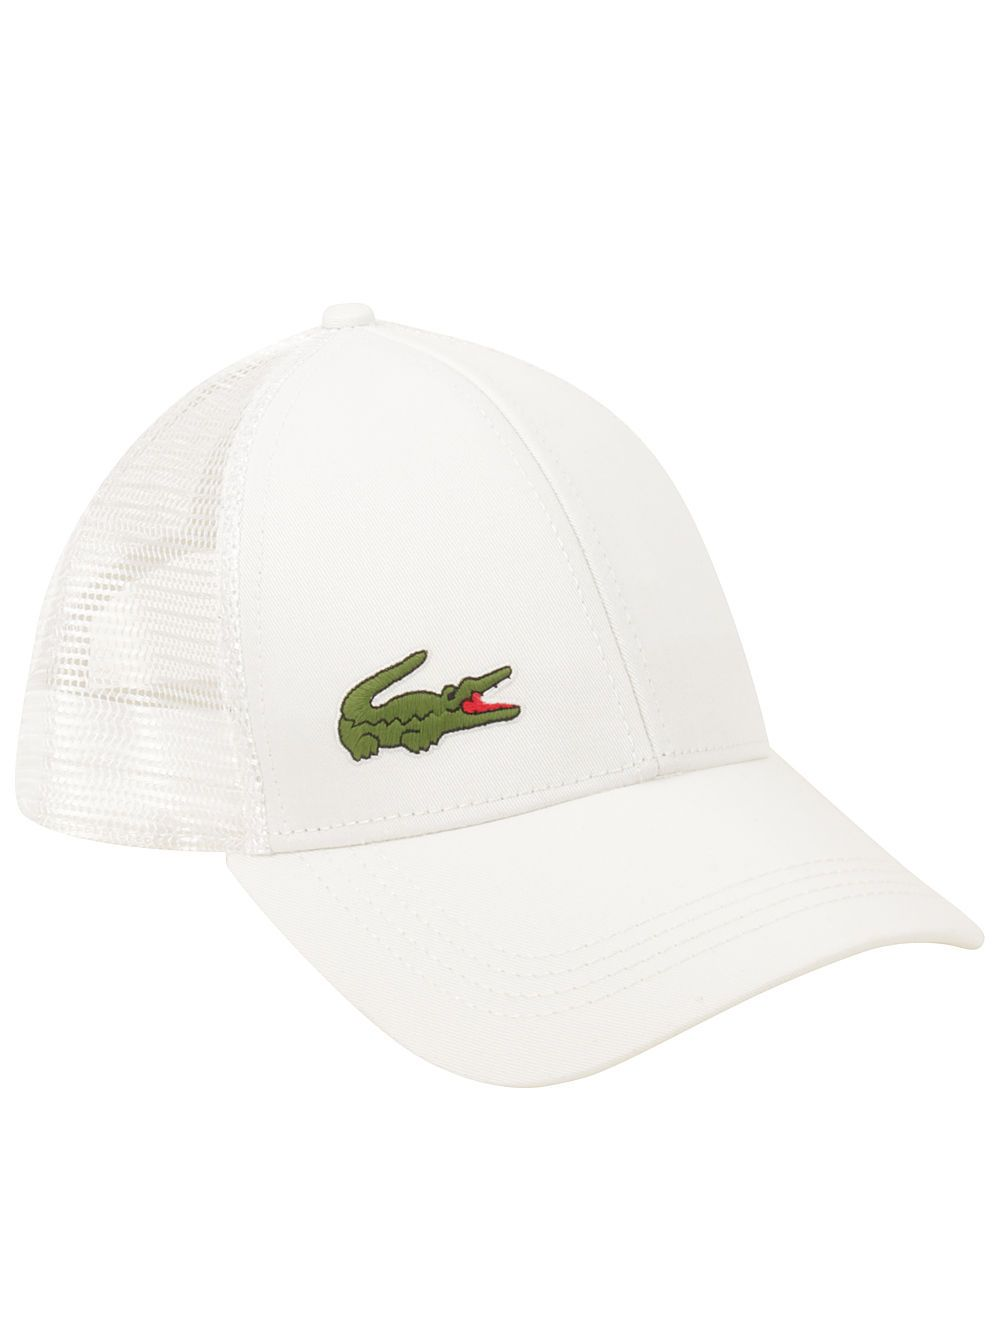 2f7bf1a10e1d0 Lacoste Men S Premium Sport Adjustable Gabardine Mesh Hat Croc Logo White